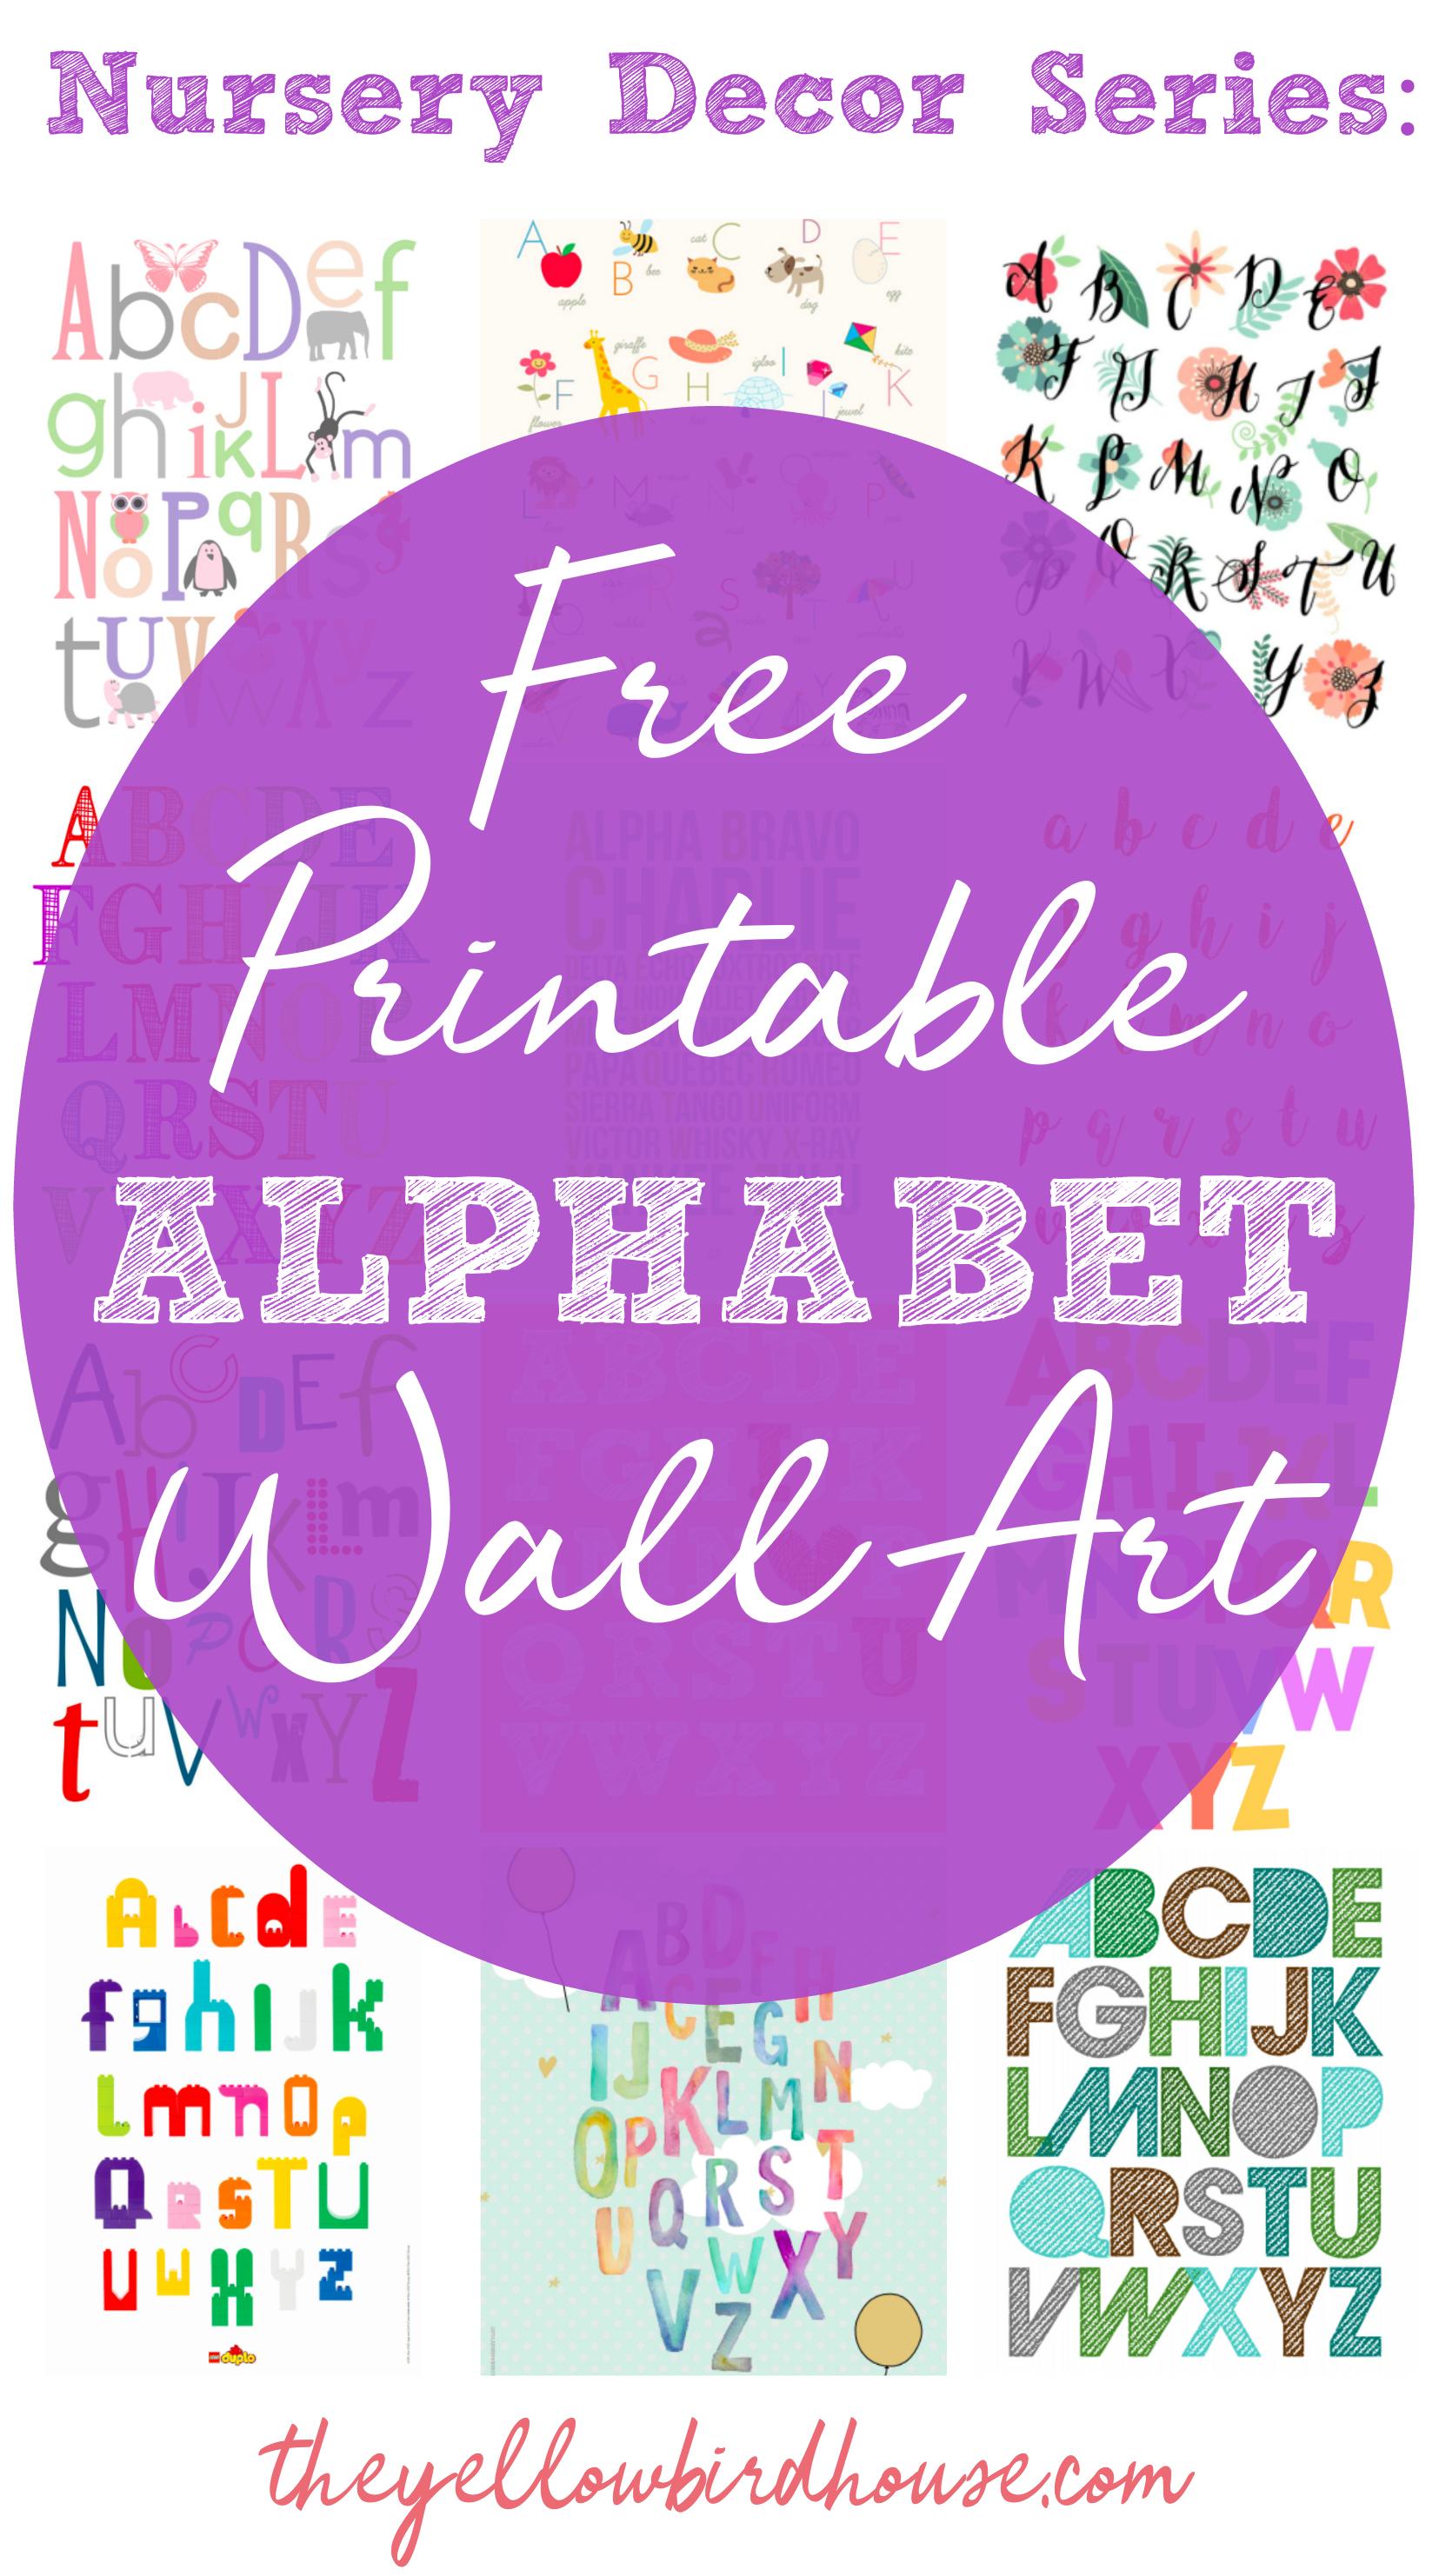 Nursery Decor Series: 19 Free Printable Alphabet Wall Art Pieces - Free Printable Preschool Posters